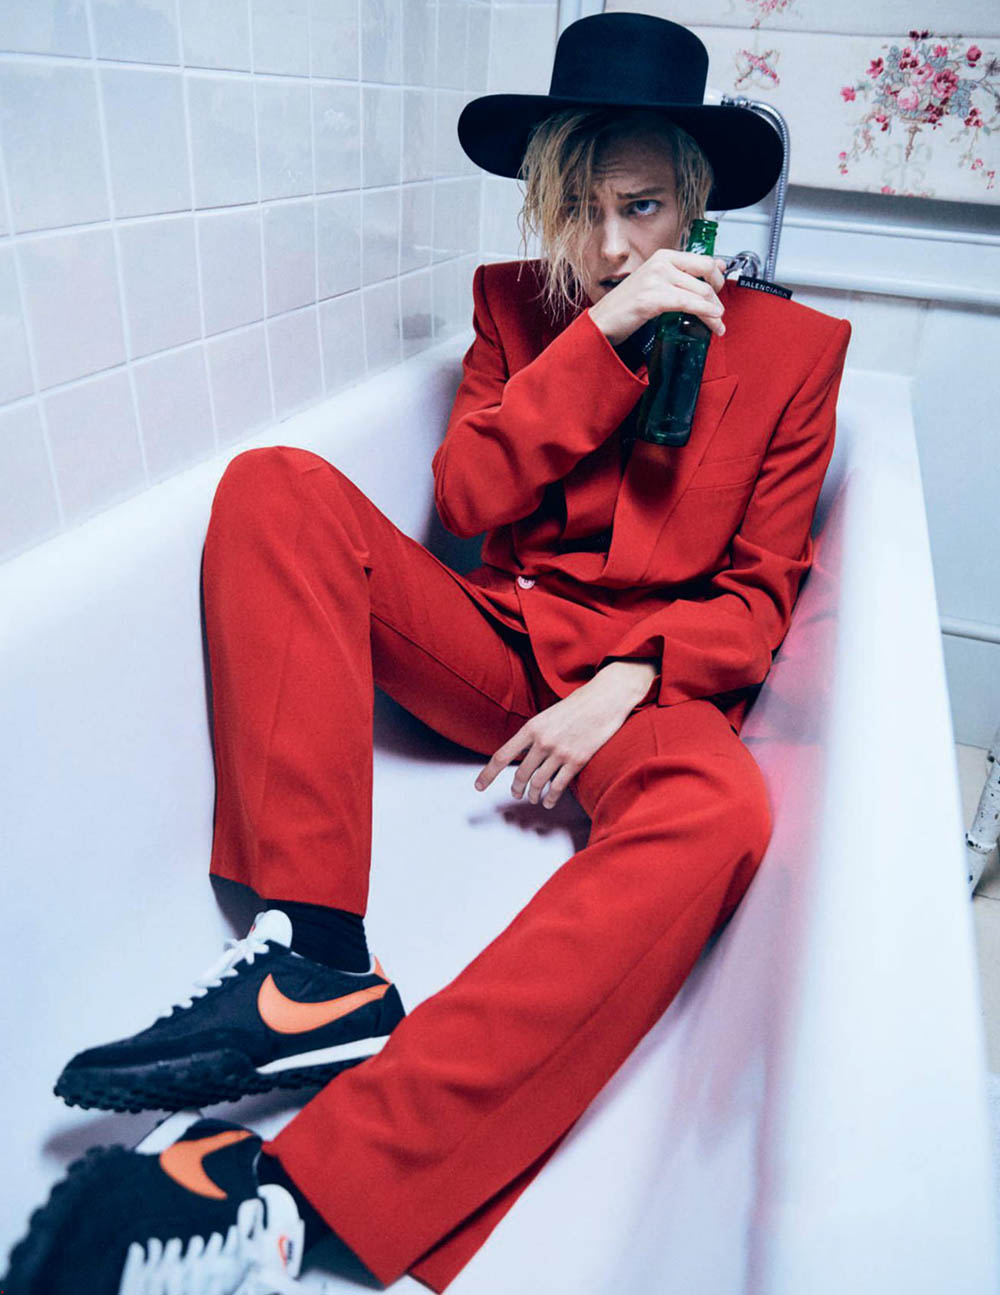 Erika Linder covers Vogue Paris February 2019 by Mikael Jansson